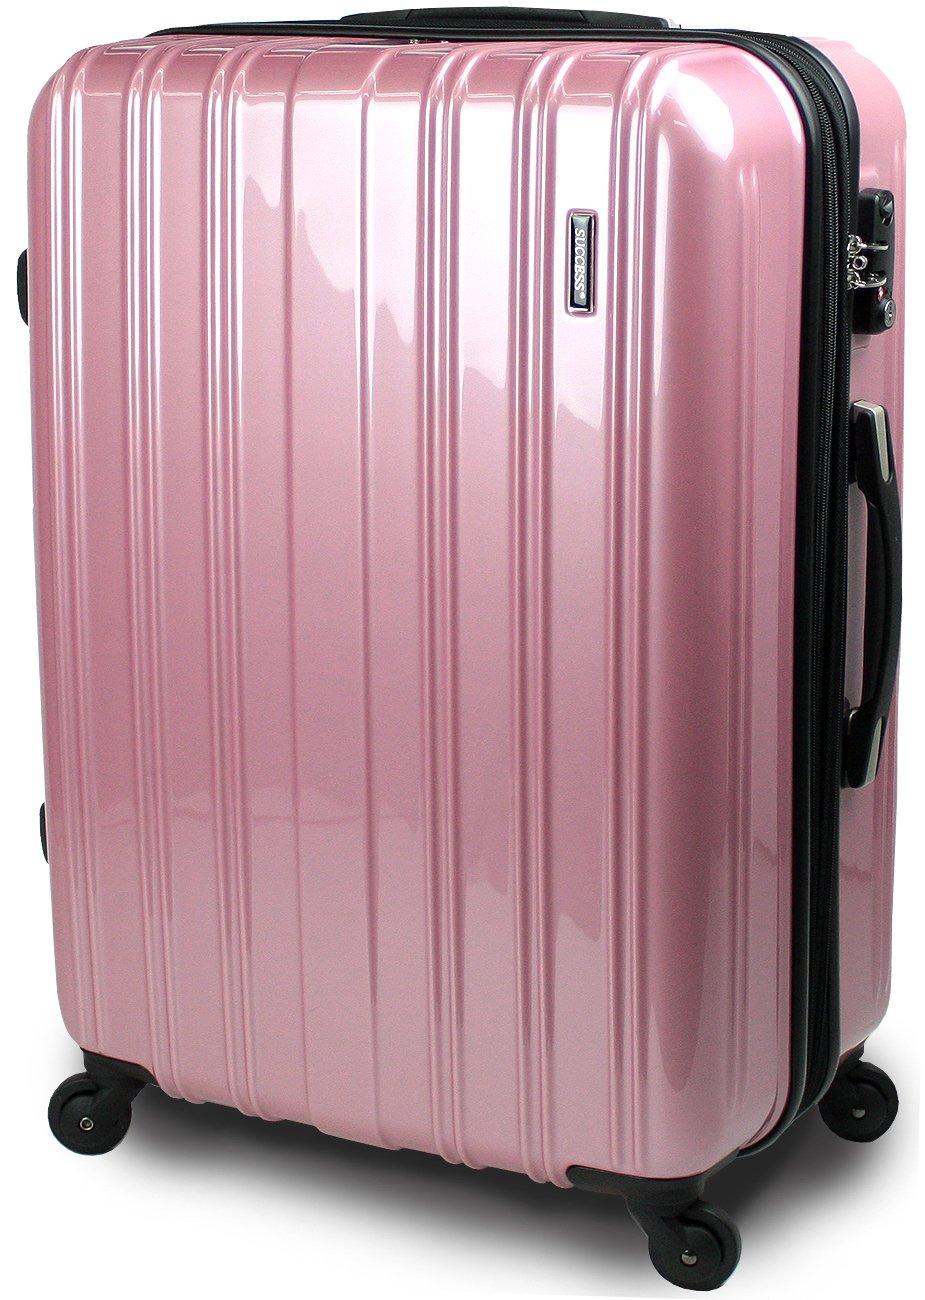 【SUCCESS サクセス】 スーツケース 3サイズ( 大型  ジャスト型  中型 ) TSAロック 搭載 超軽量 レグノライト2020~ ミラー加工 キャリーバッグ B00BEG5B7G 中型 66㎝|スイートピンク スイートピンク 中型 66㎝